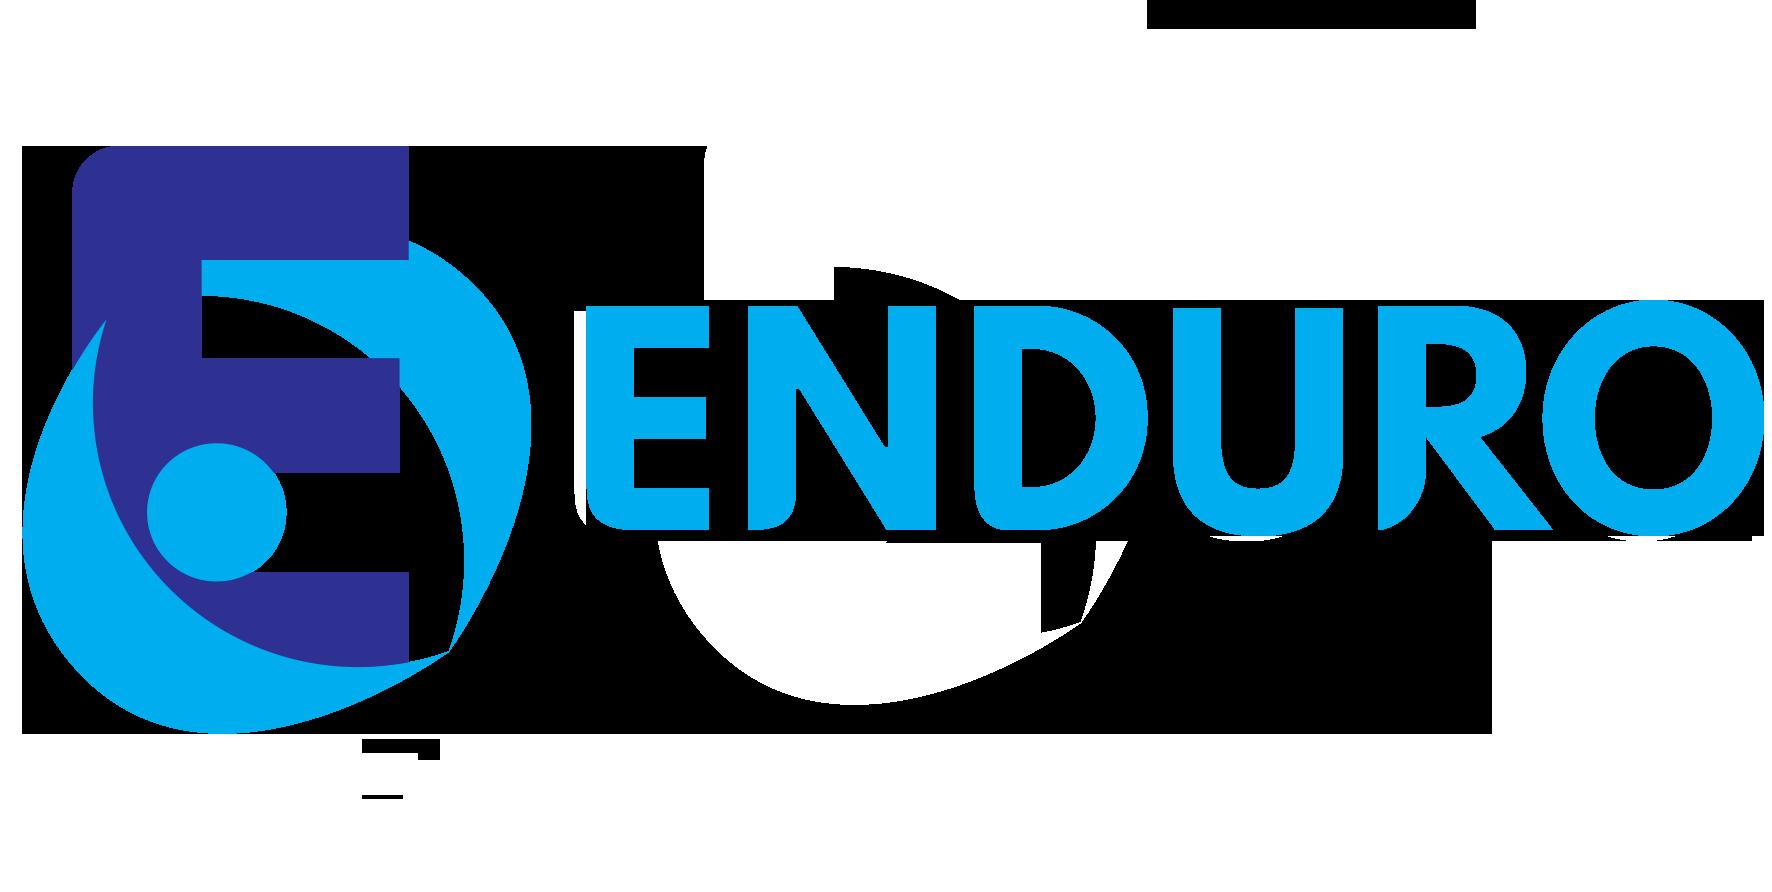 END-logo-horizontaal